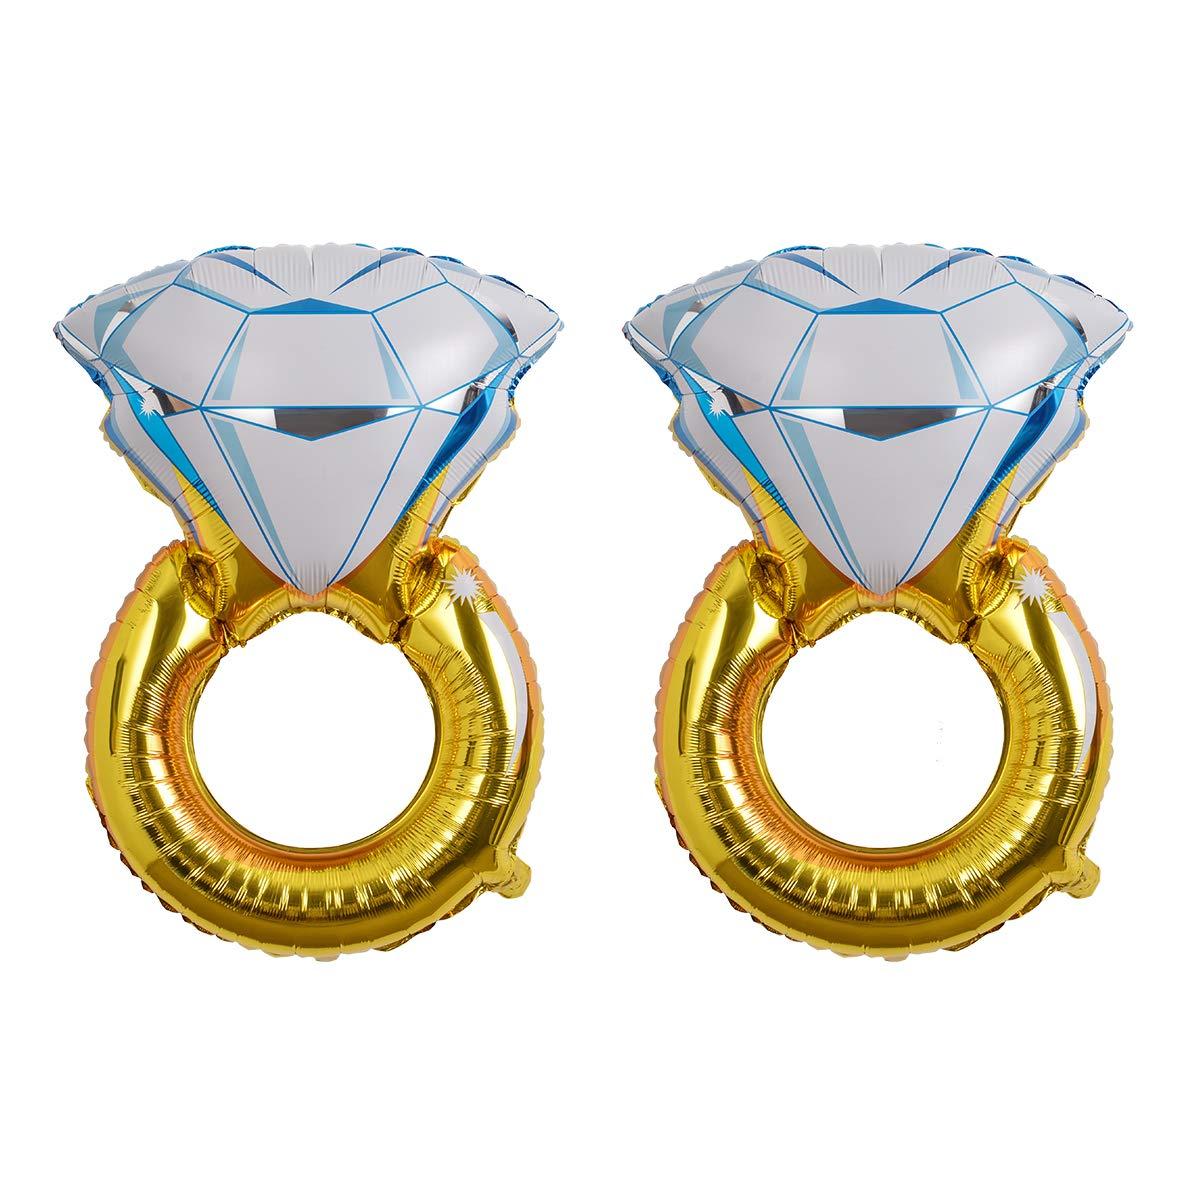 Junggesellenabschied Hochzeitsdekoration 2 Teile // Satz Hivexagon Giant Diamond Ring Folienballons f/ür Junggesellenabschied HP042 Gold Farbe Verlobungsfeier